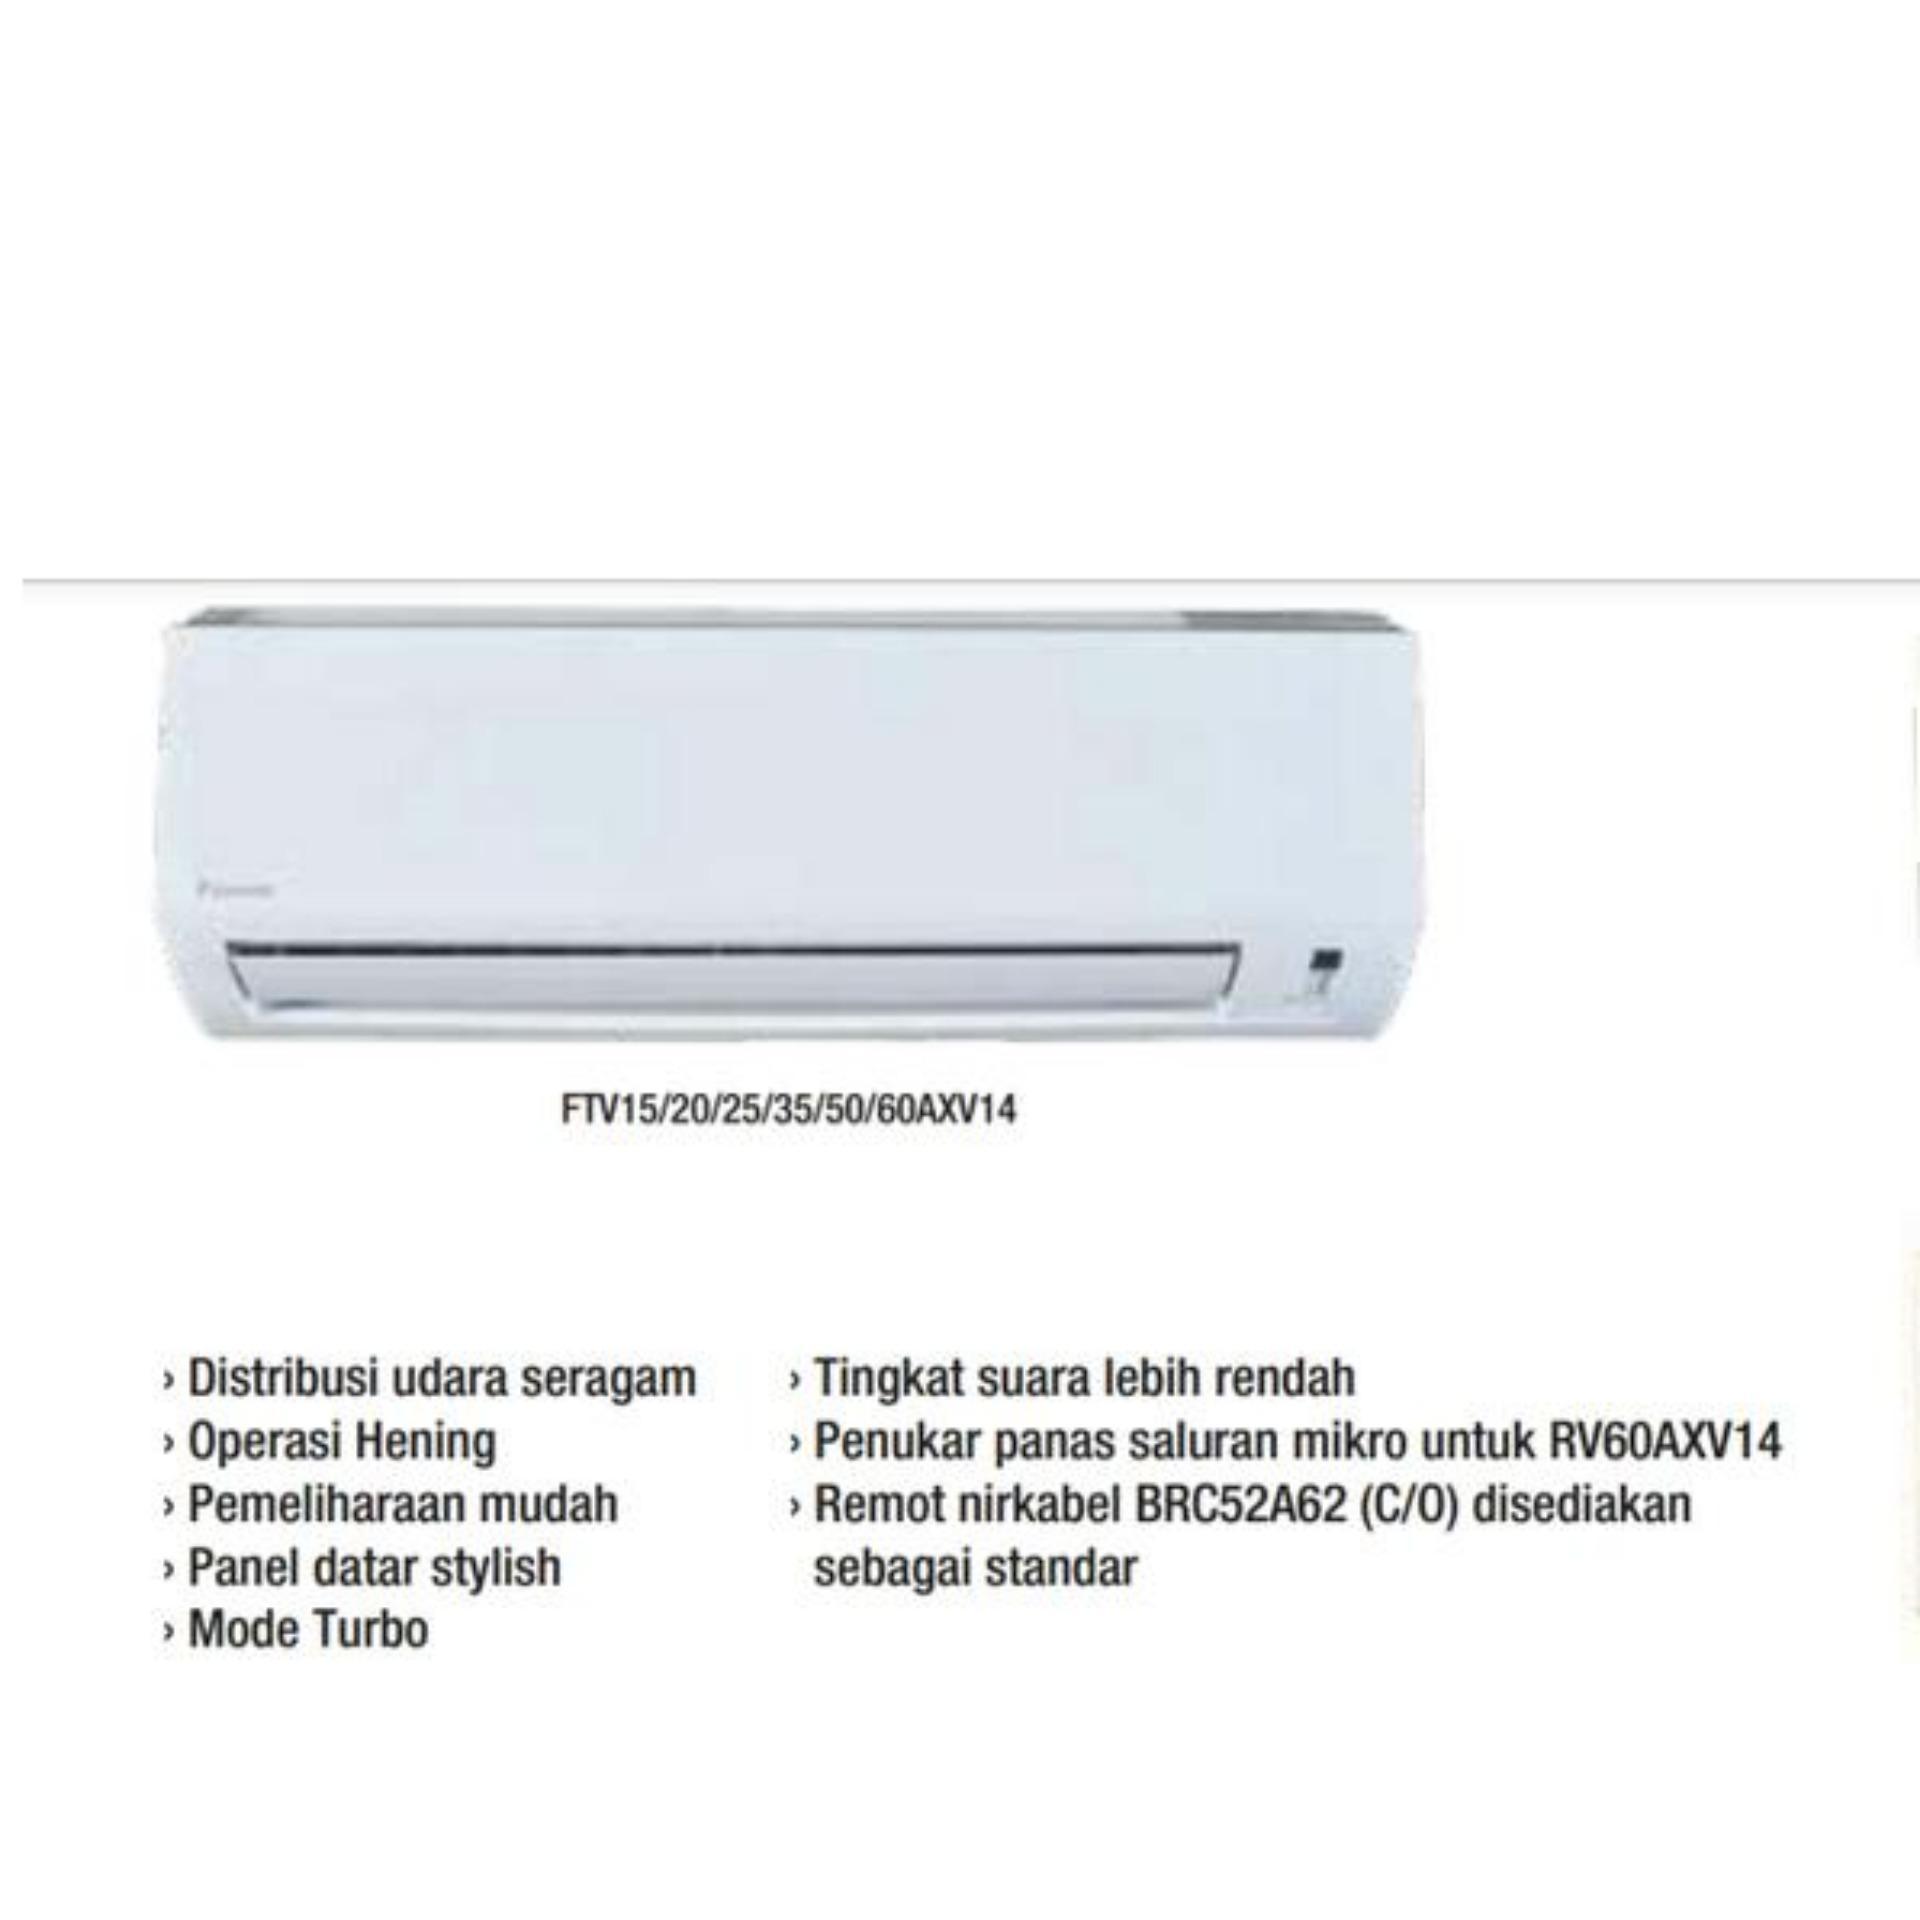 Ac Daikin Split ftv25axv14 1pk (Malaysia) - Putih SAMSUNG TV LED UA32FH4003R FREE ONGKIR KHUSUS JAKARTA (DETABEK MINIMAL 2 UNIT)